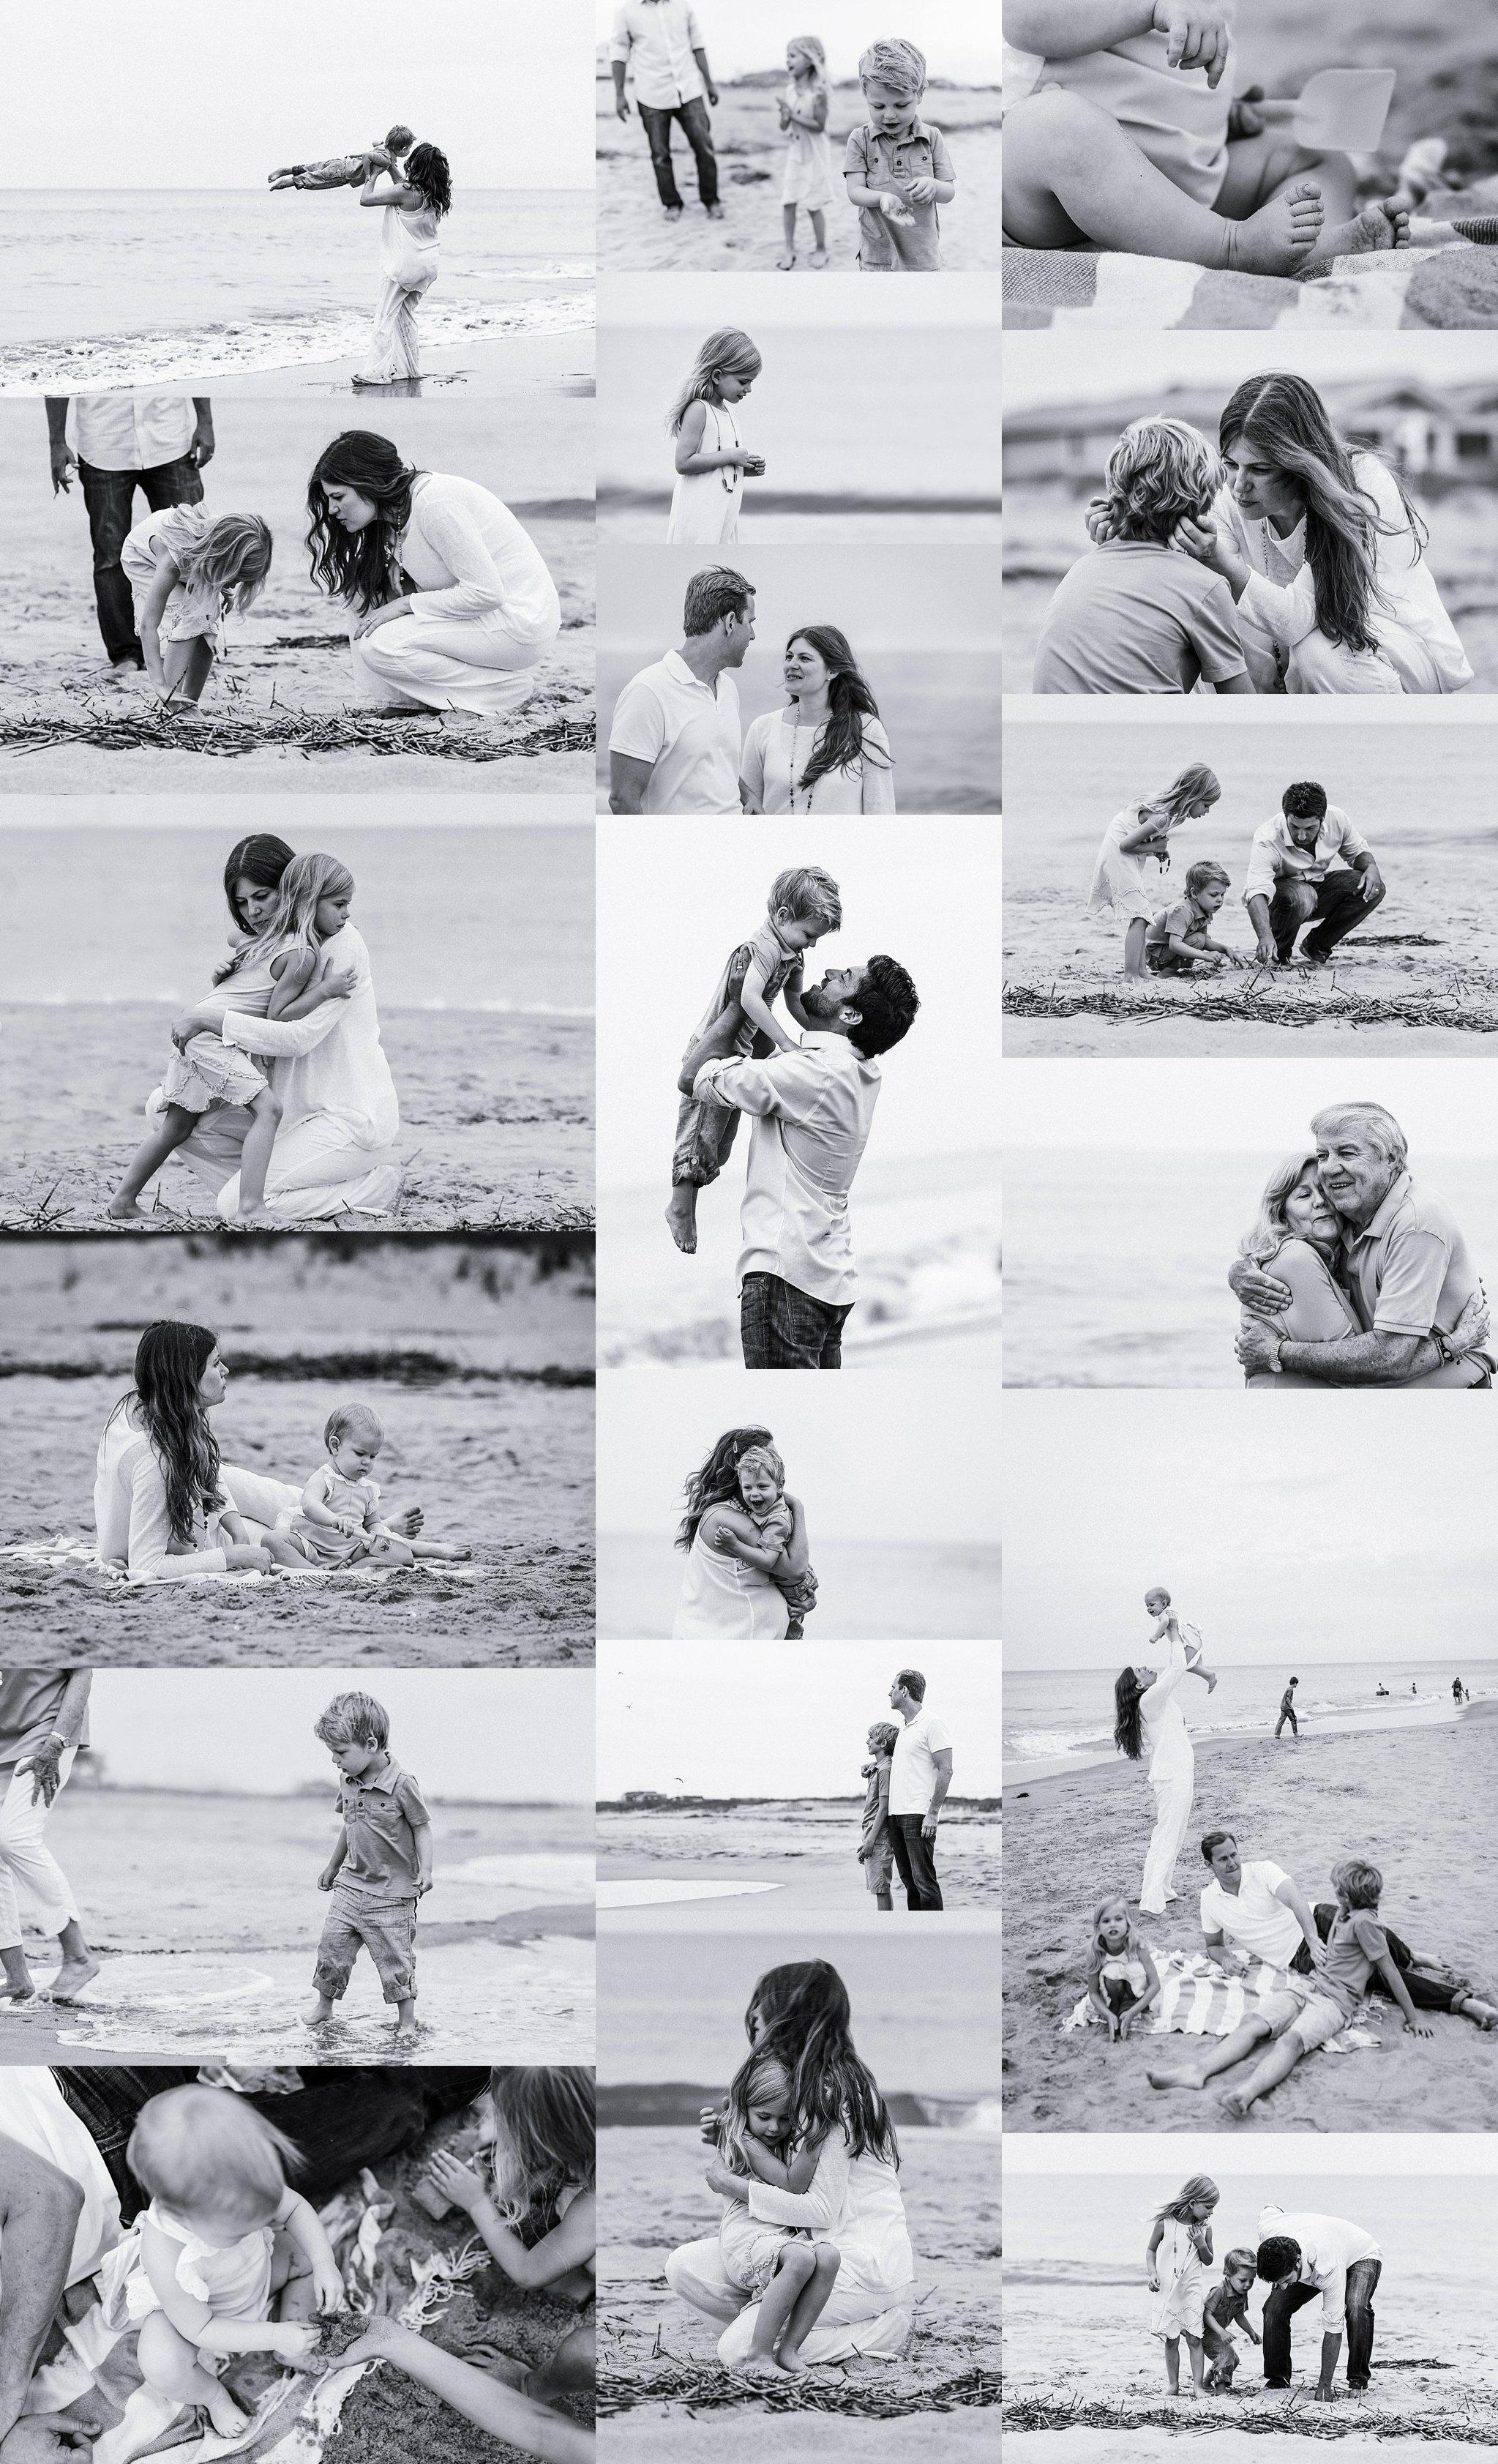 black-and-white-family-beach-session-photos-lifestyle-family-photography-inspiration-virginia-beach-photographer-melissa-bliss-photography